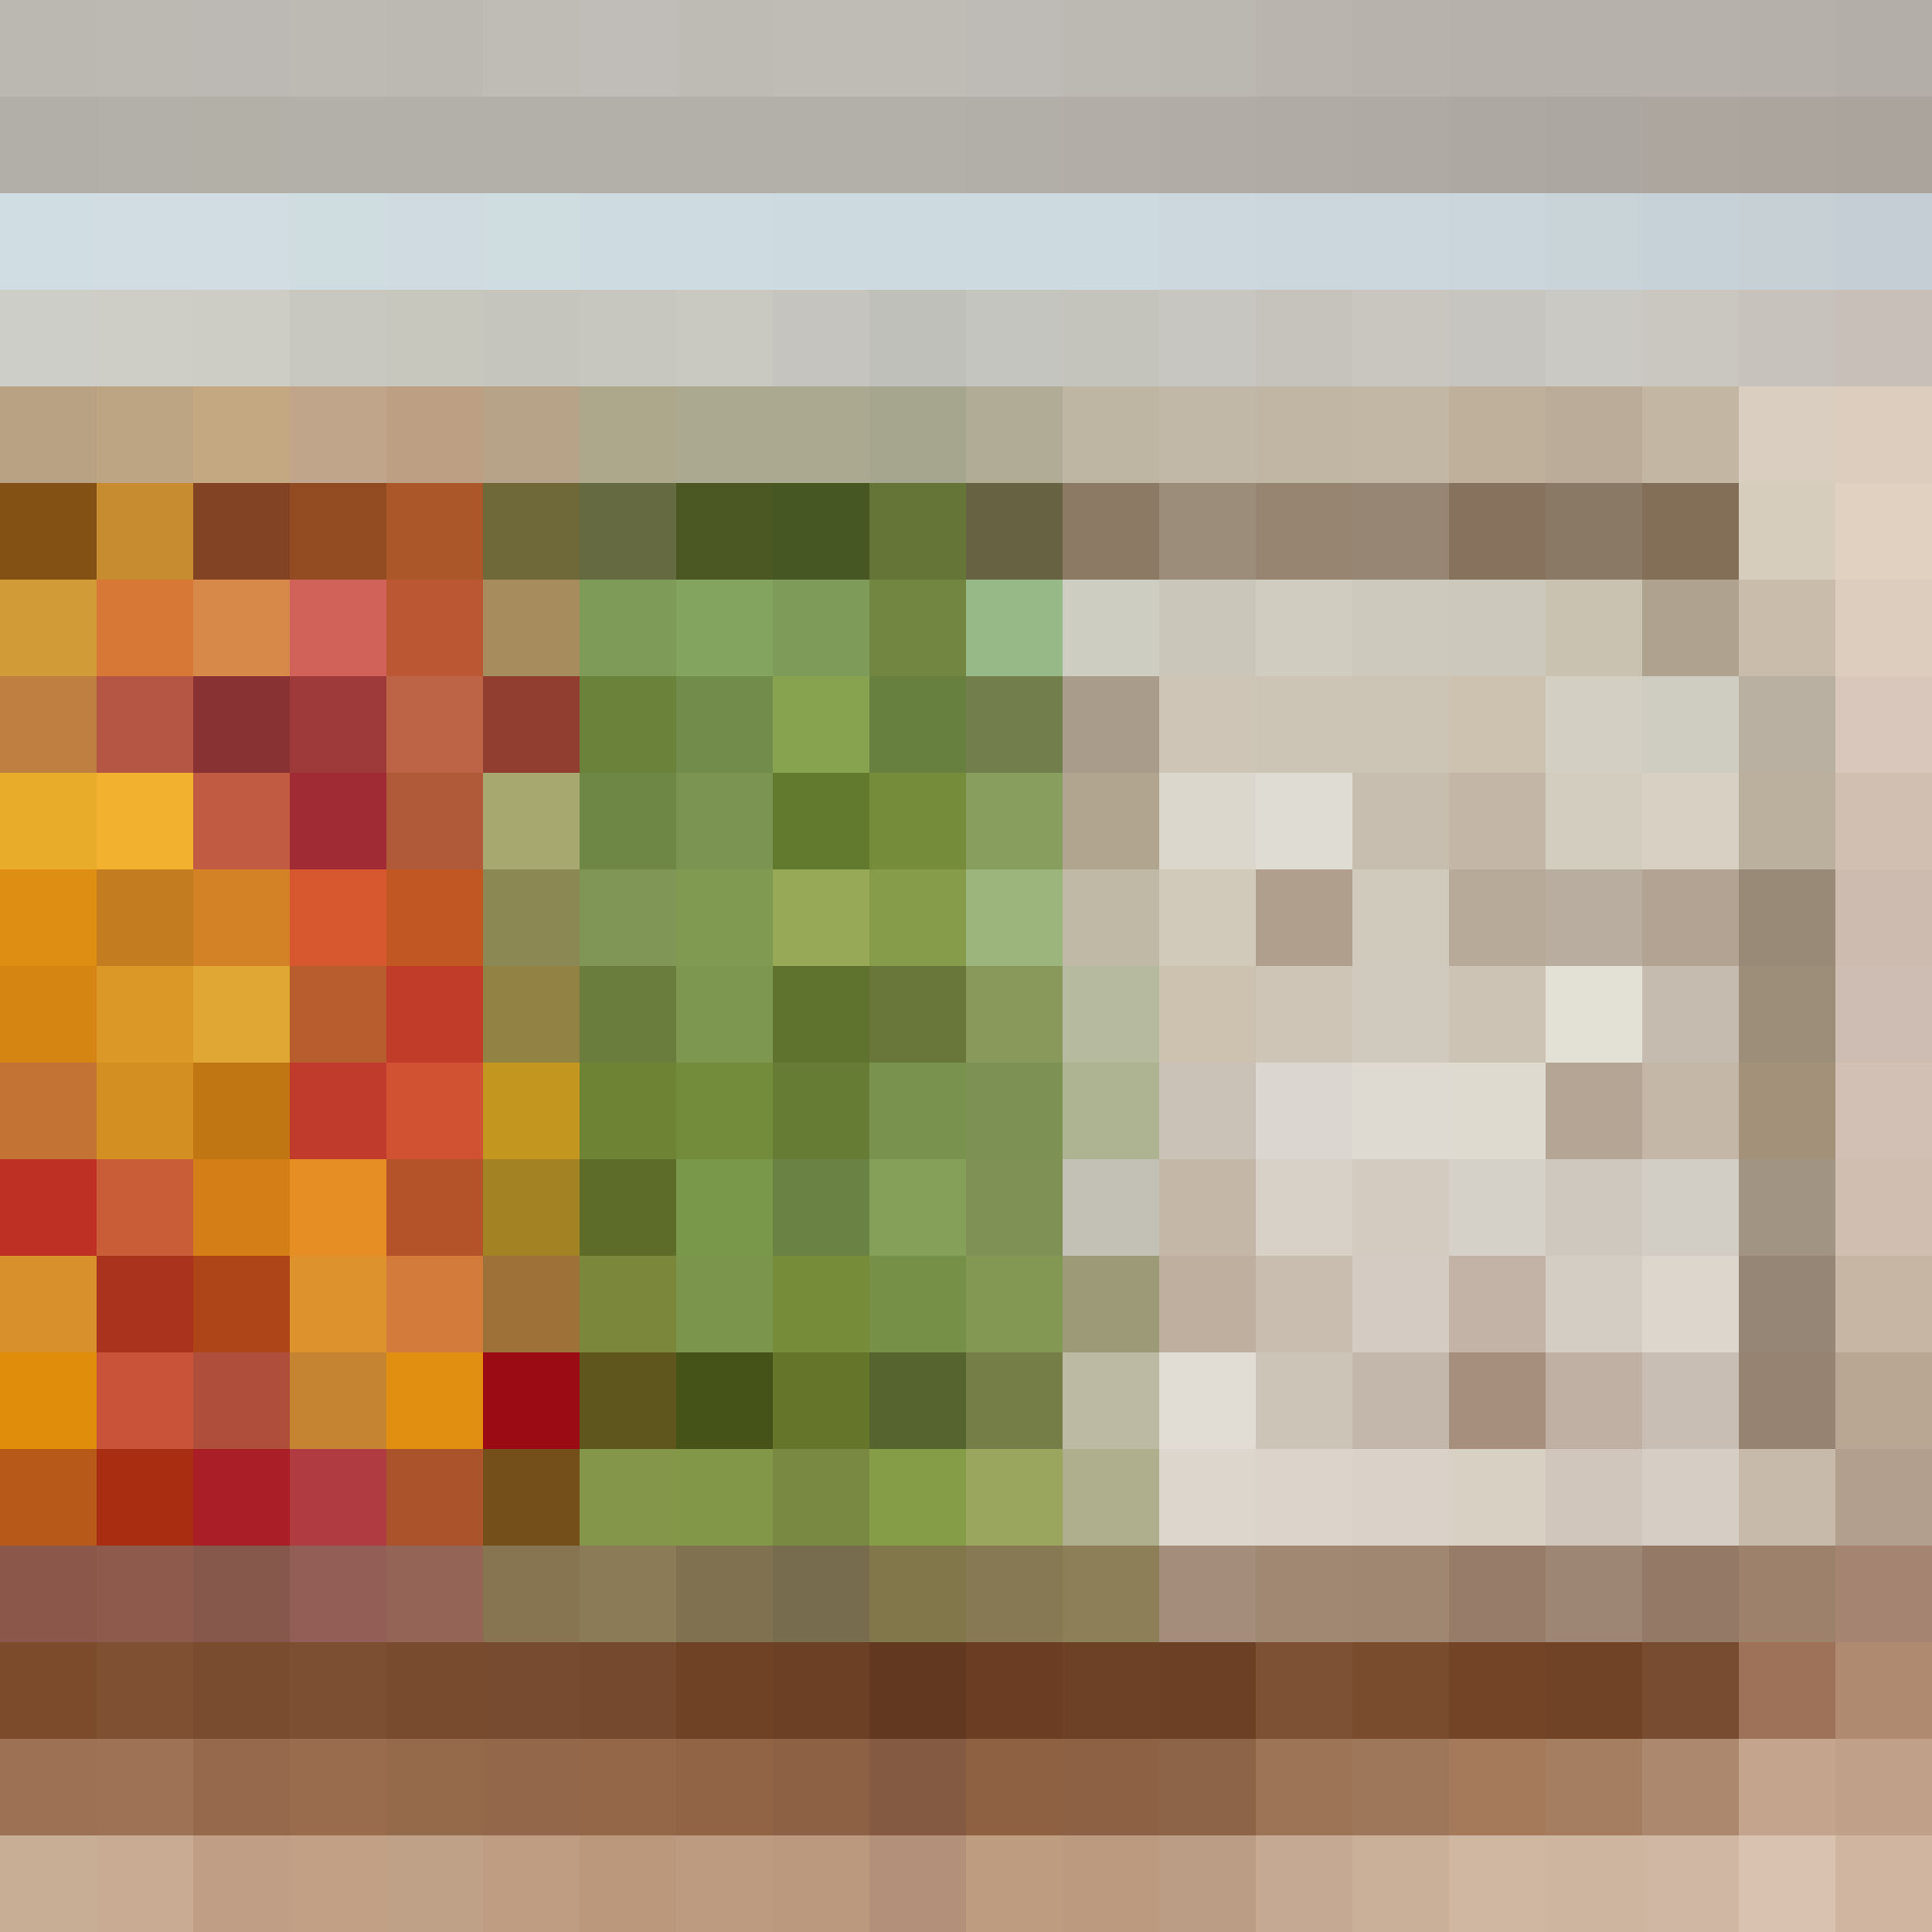 How To Make Stir-Fry Freezer Meals: gallery image 6